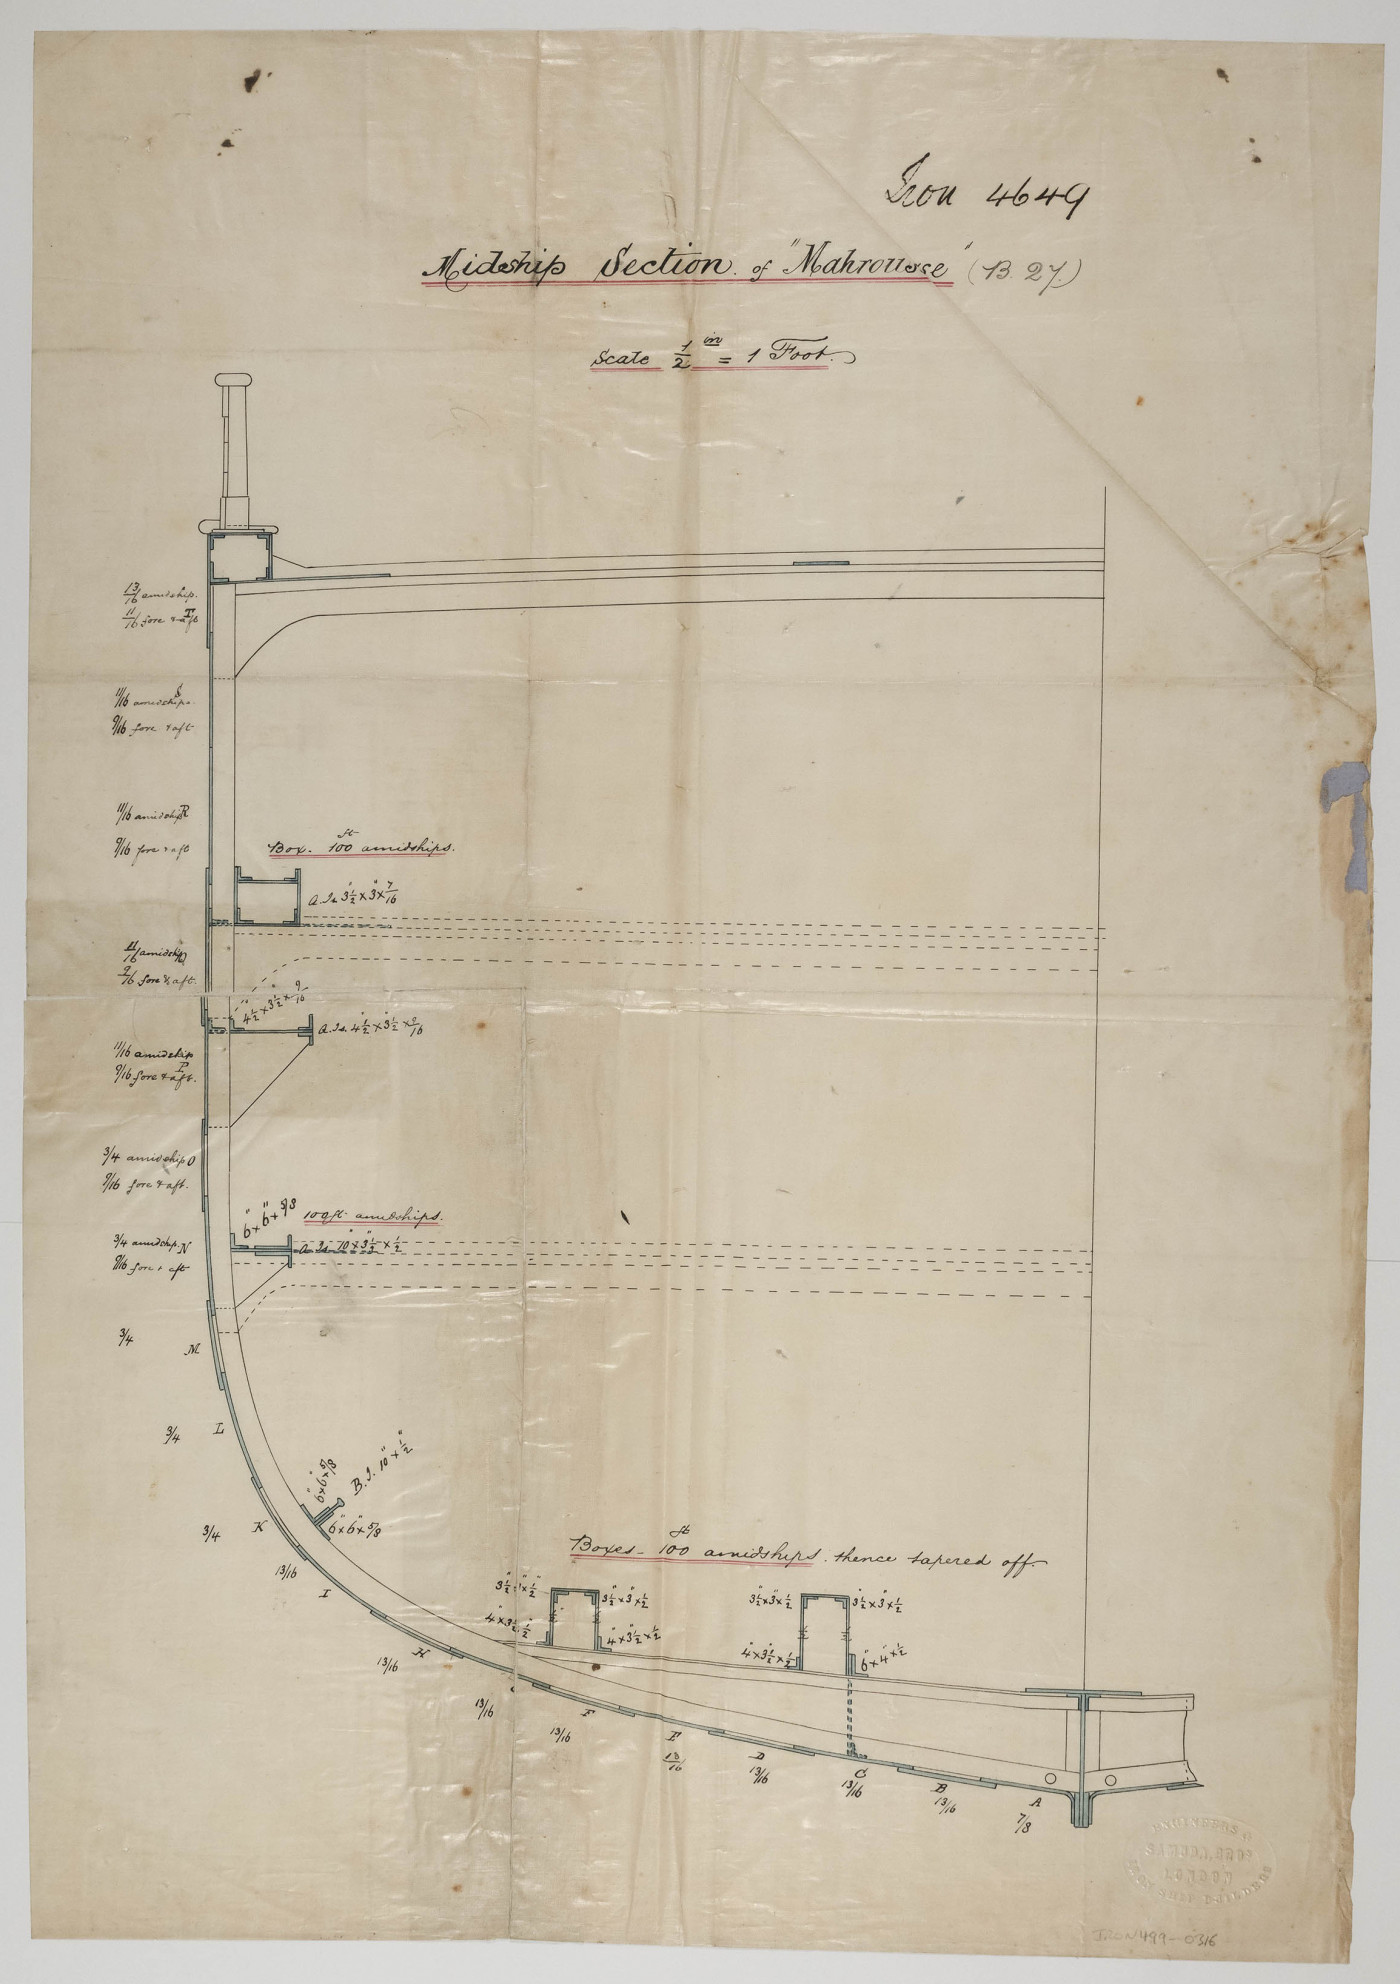 Half Midship Section Plan for <i>Mahrousse</i>,